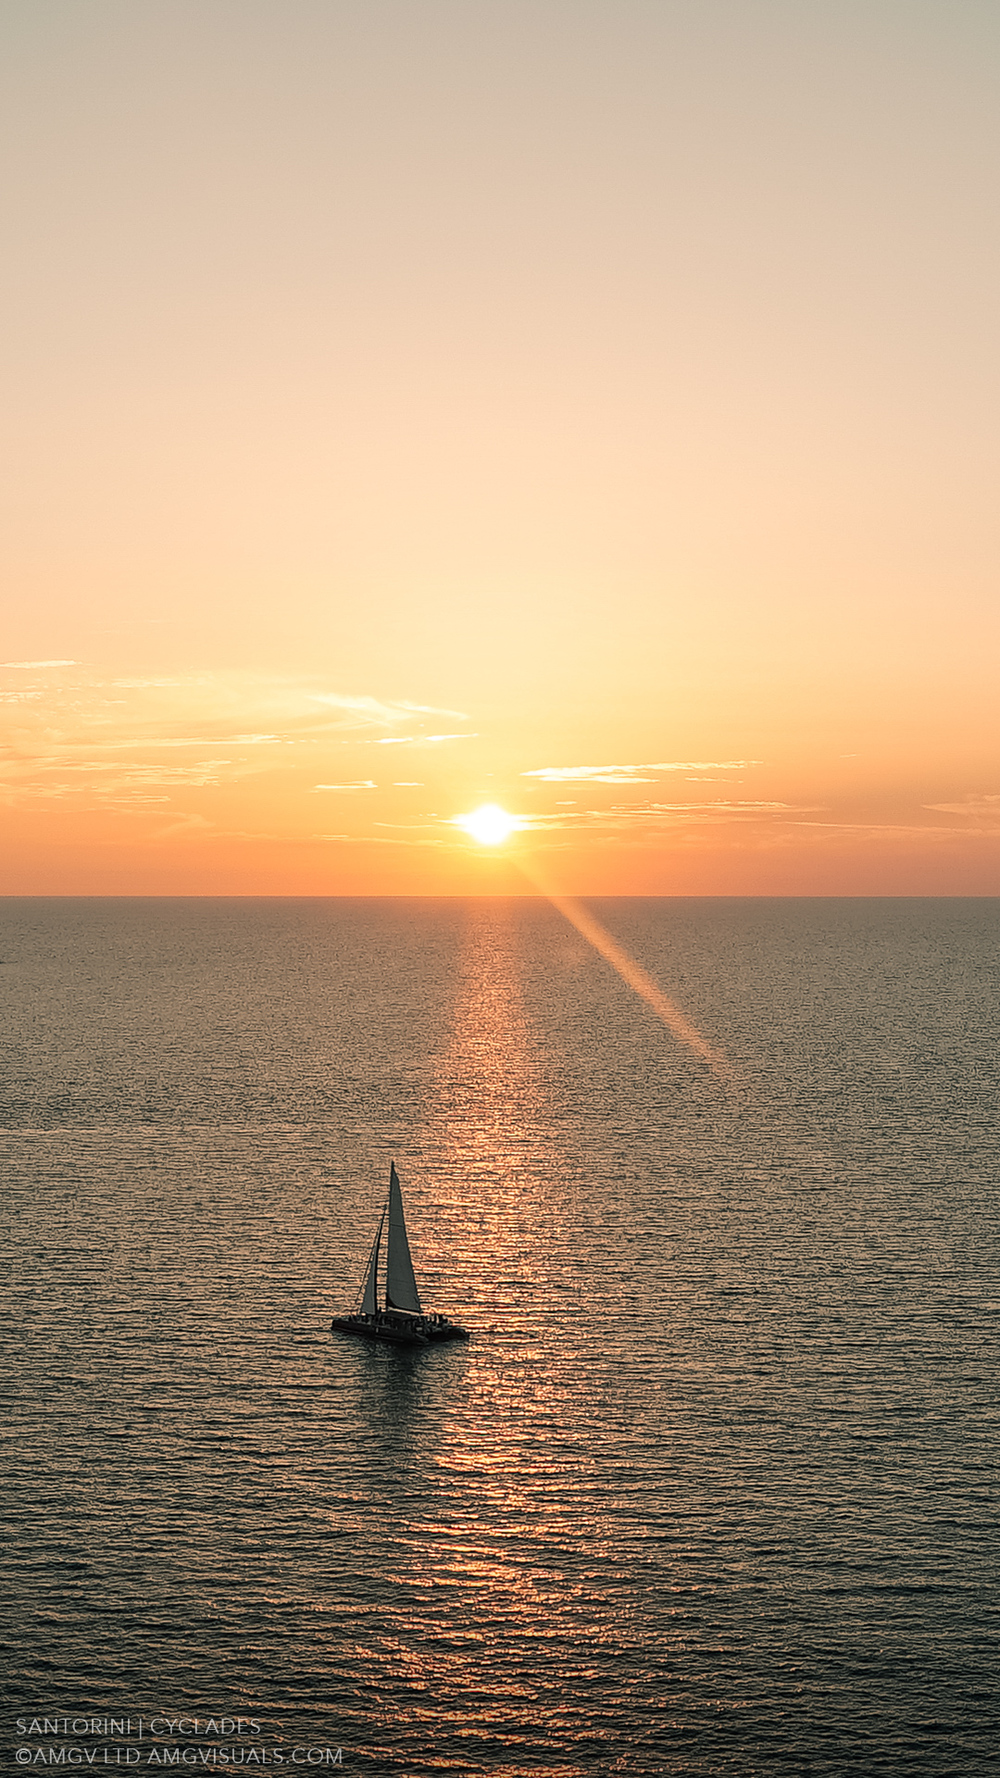 ©AMGV-LTD-Santorini+Cyclades-9.jpg